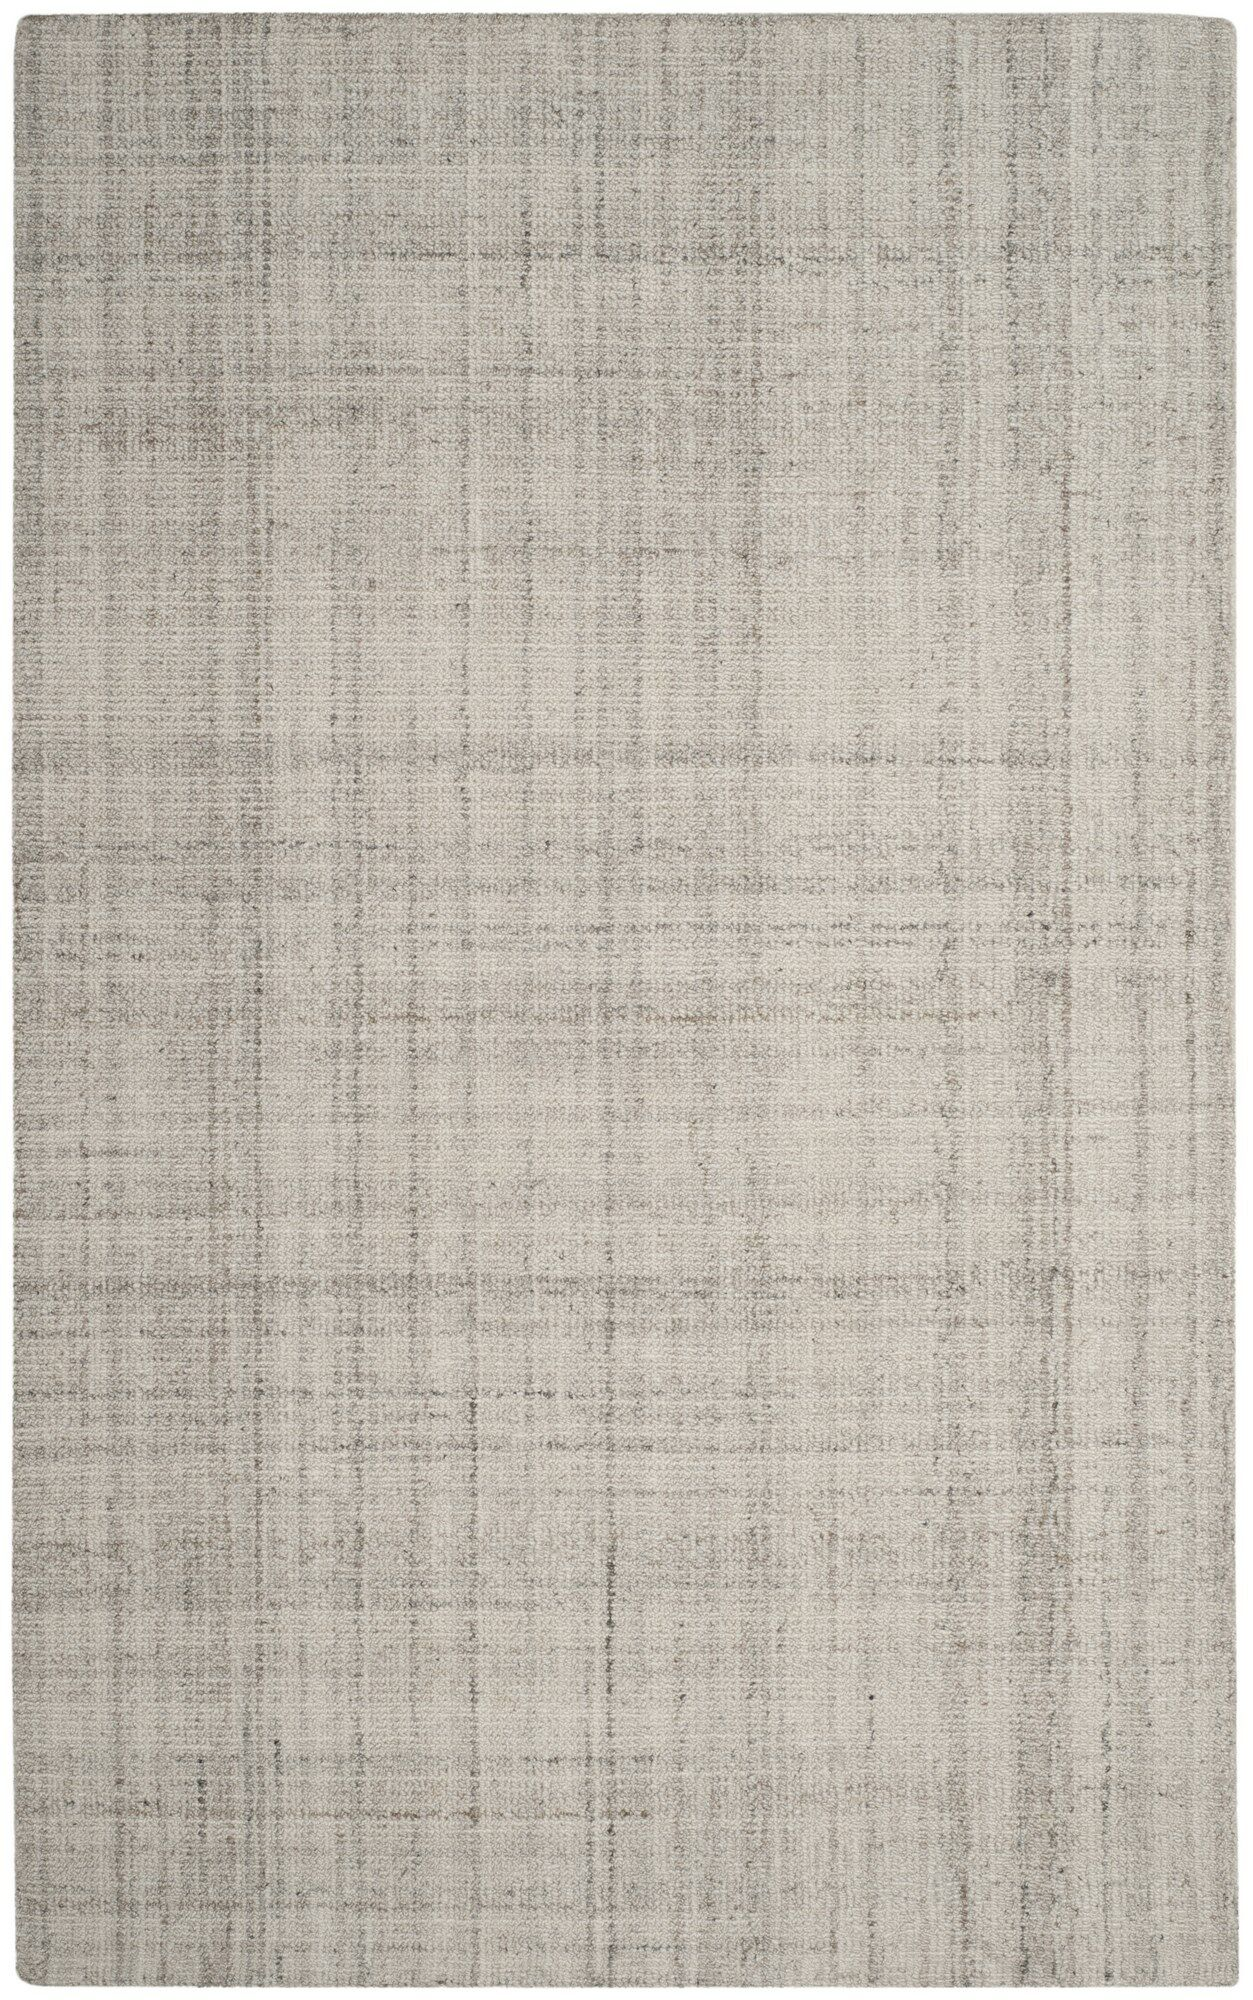 Drennon Hand-Tufted Light Gray Area Rug Rug Size: Rectangle 8' x 10'